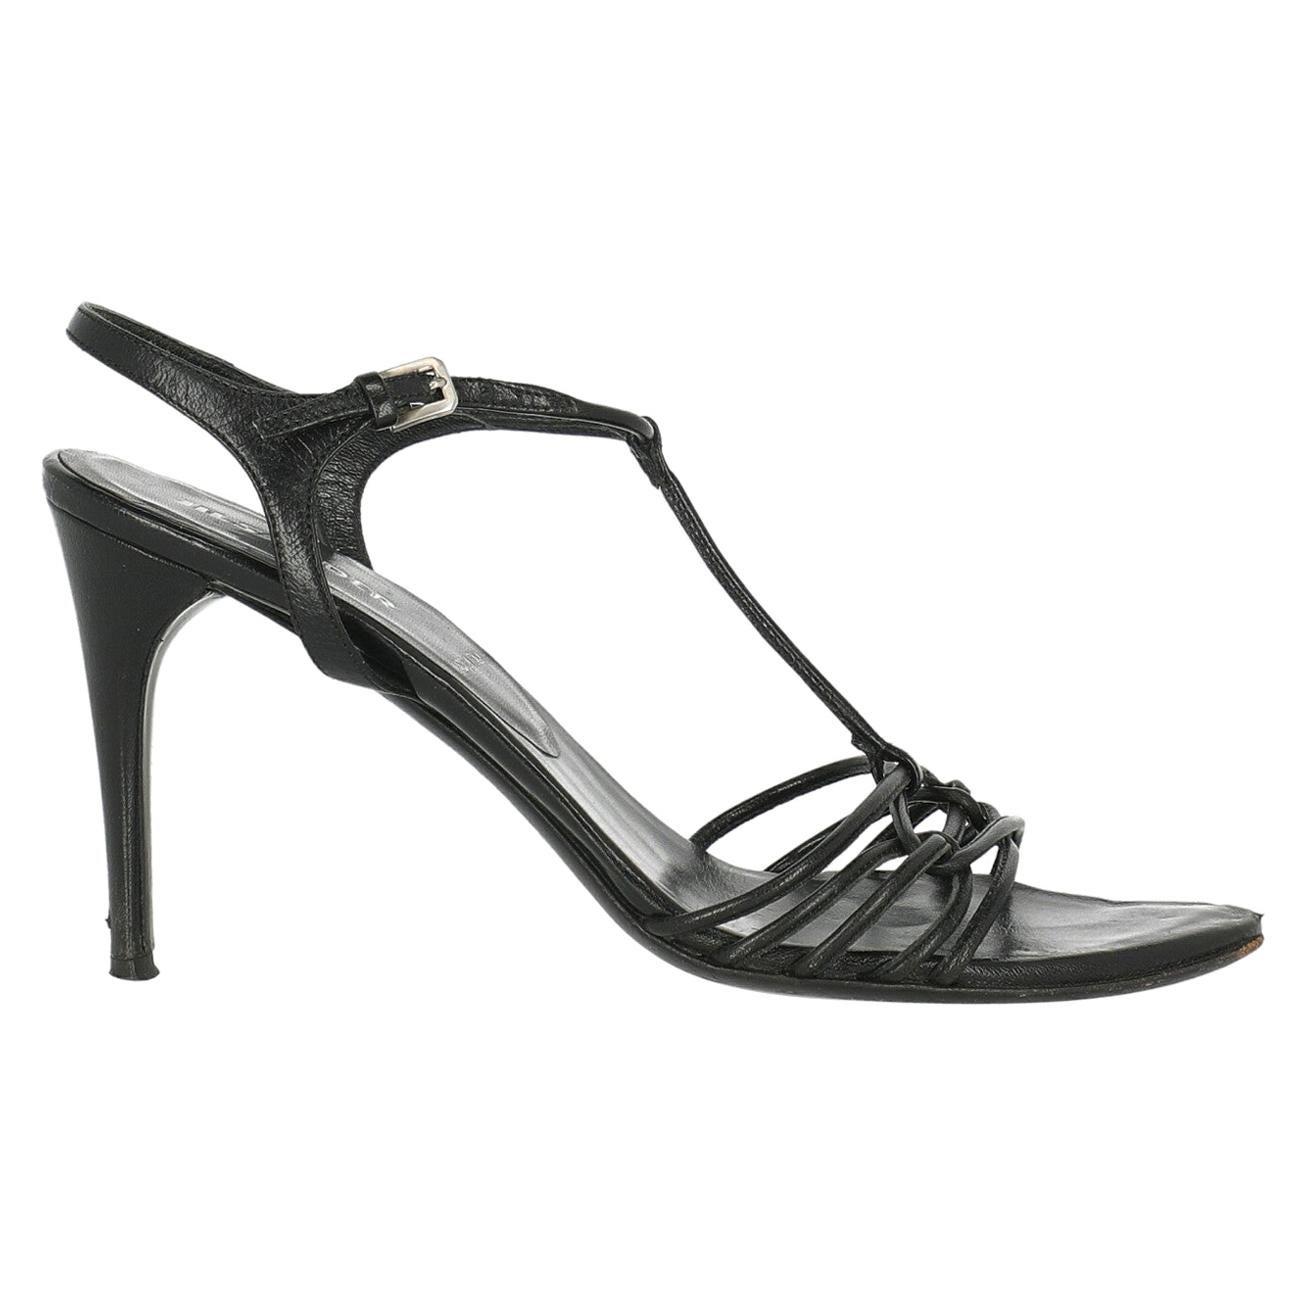 Jil Sander Woman Sandals Black Leather IT 37